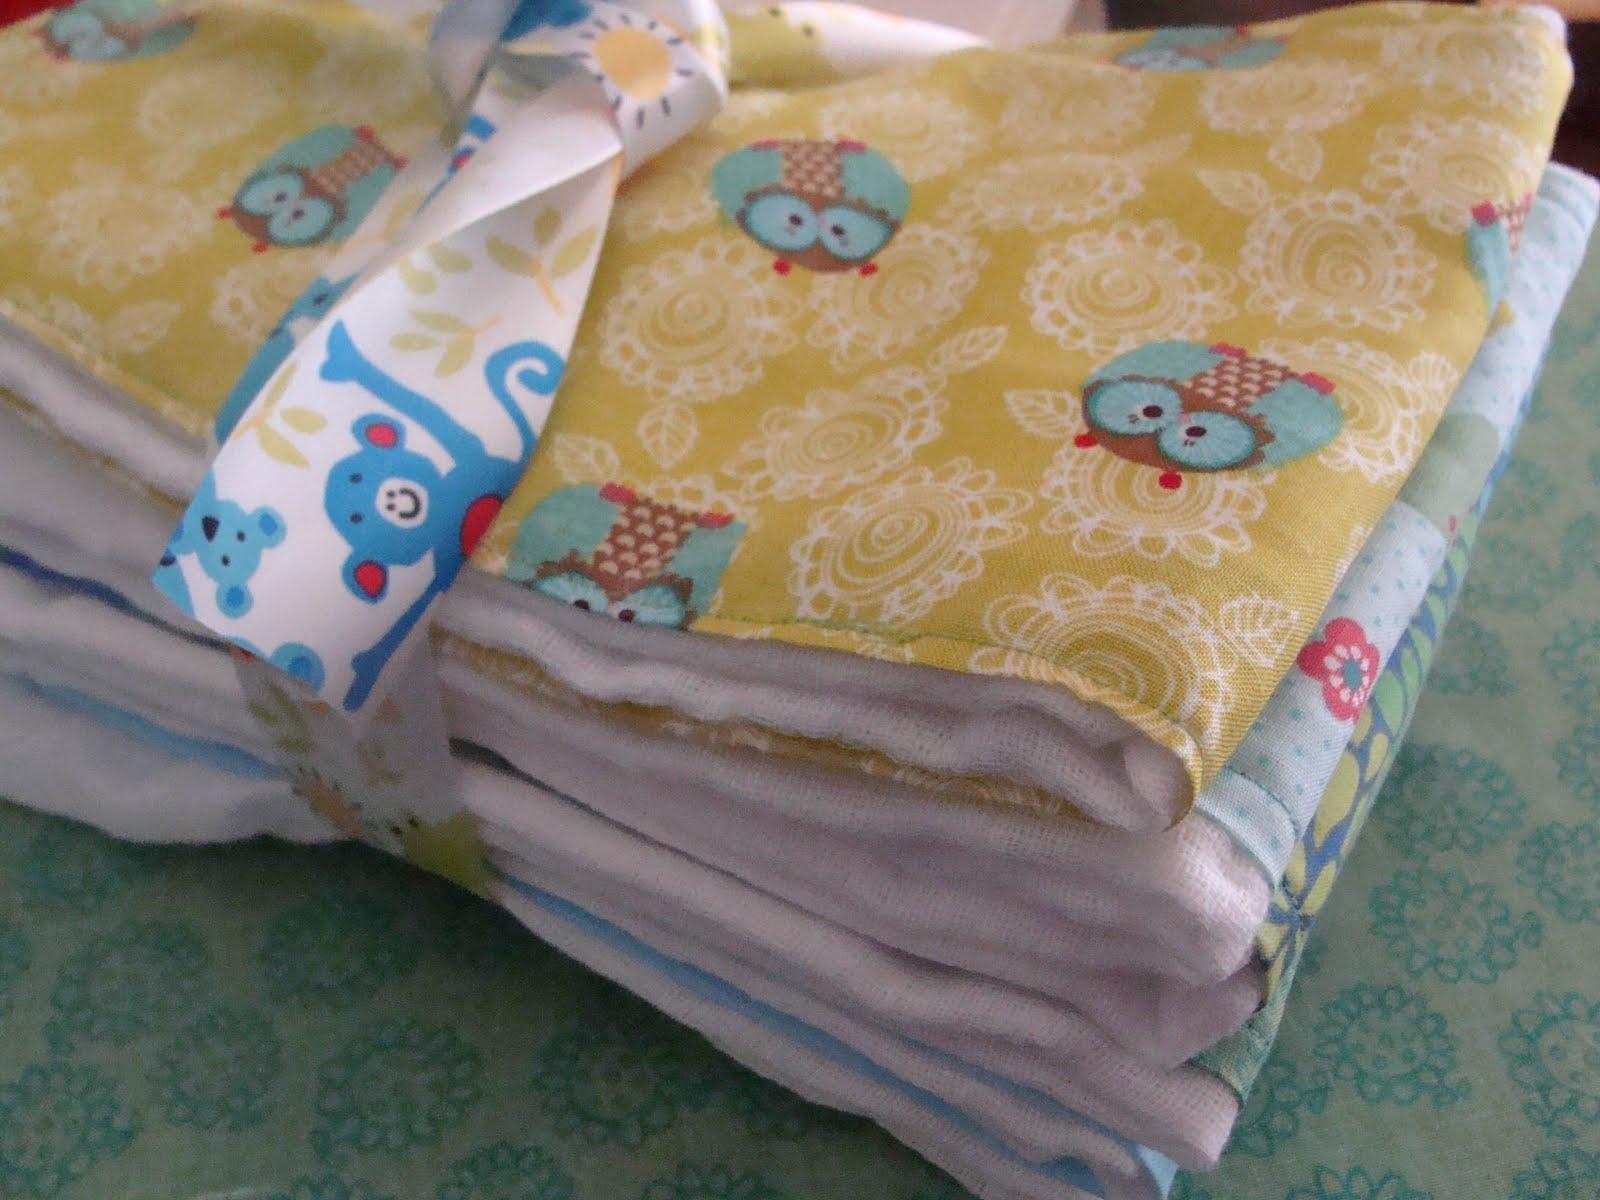 Homemade Baby Gifts Dear Creatives